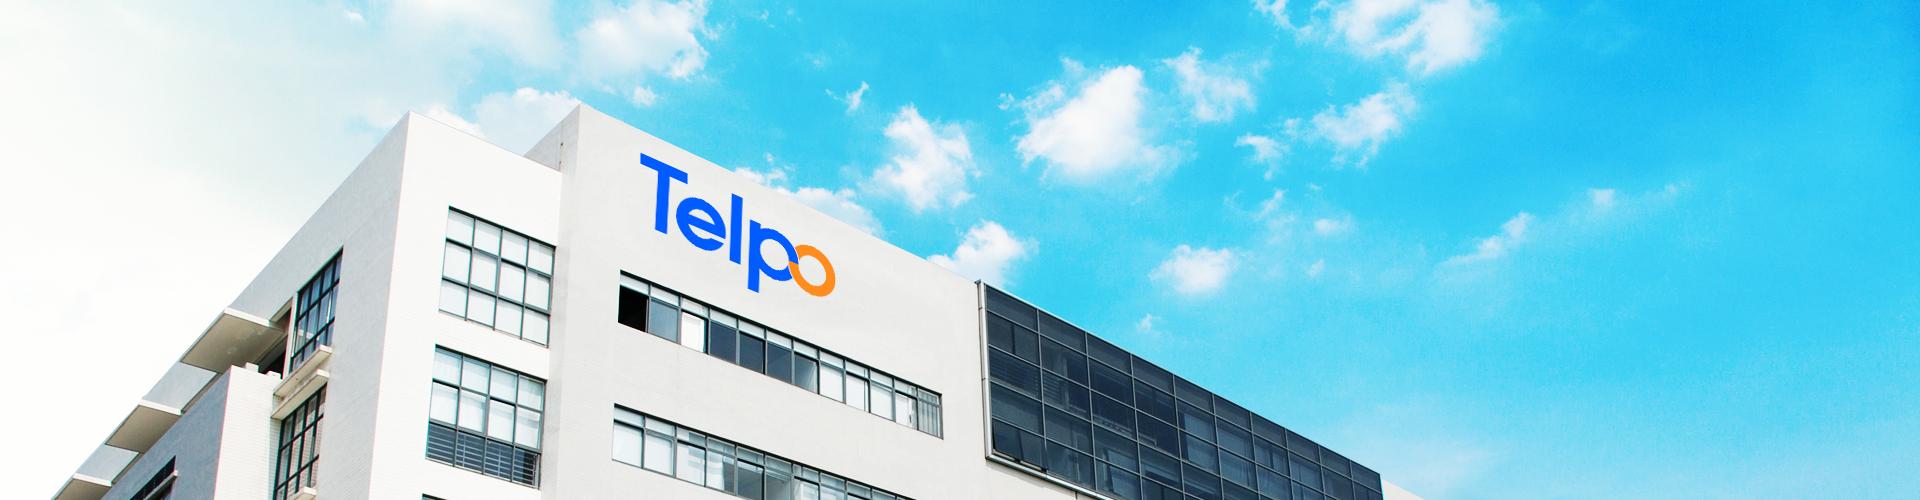 FACTORY DISPLAY-Telpo